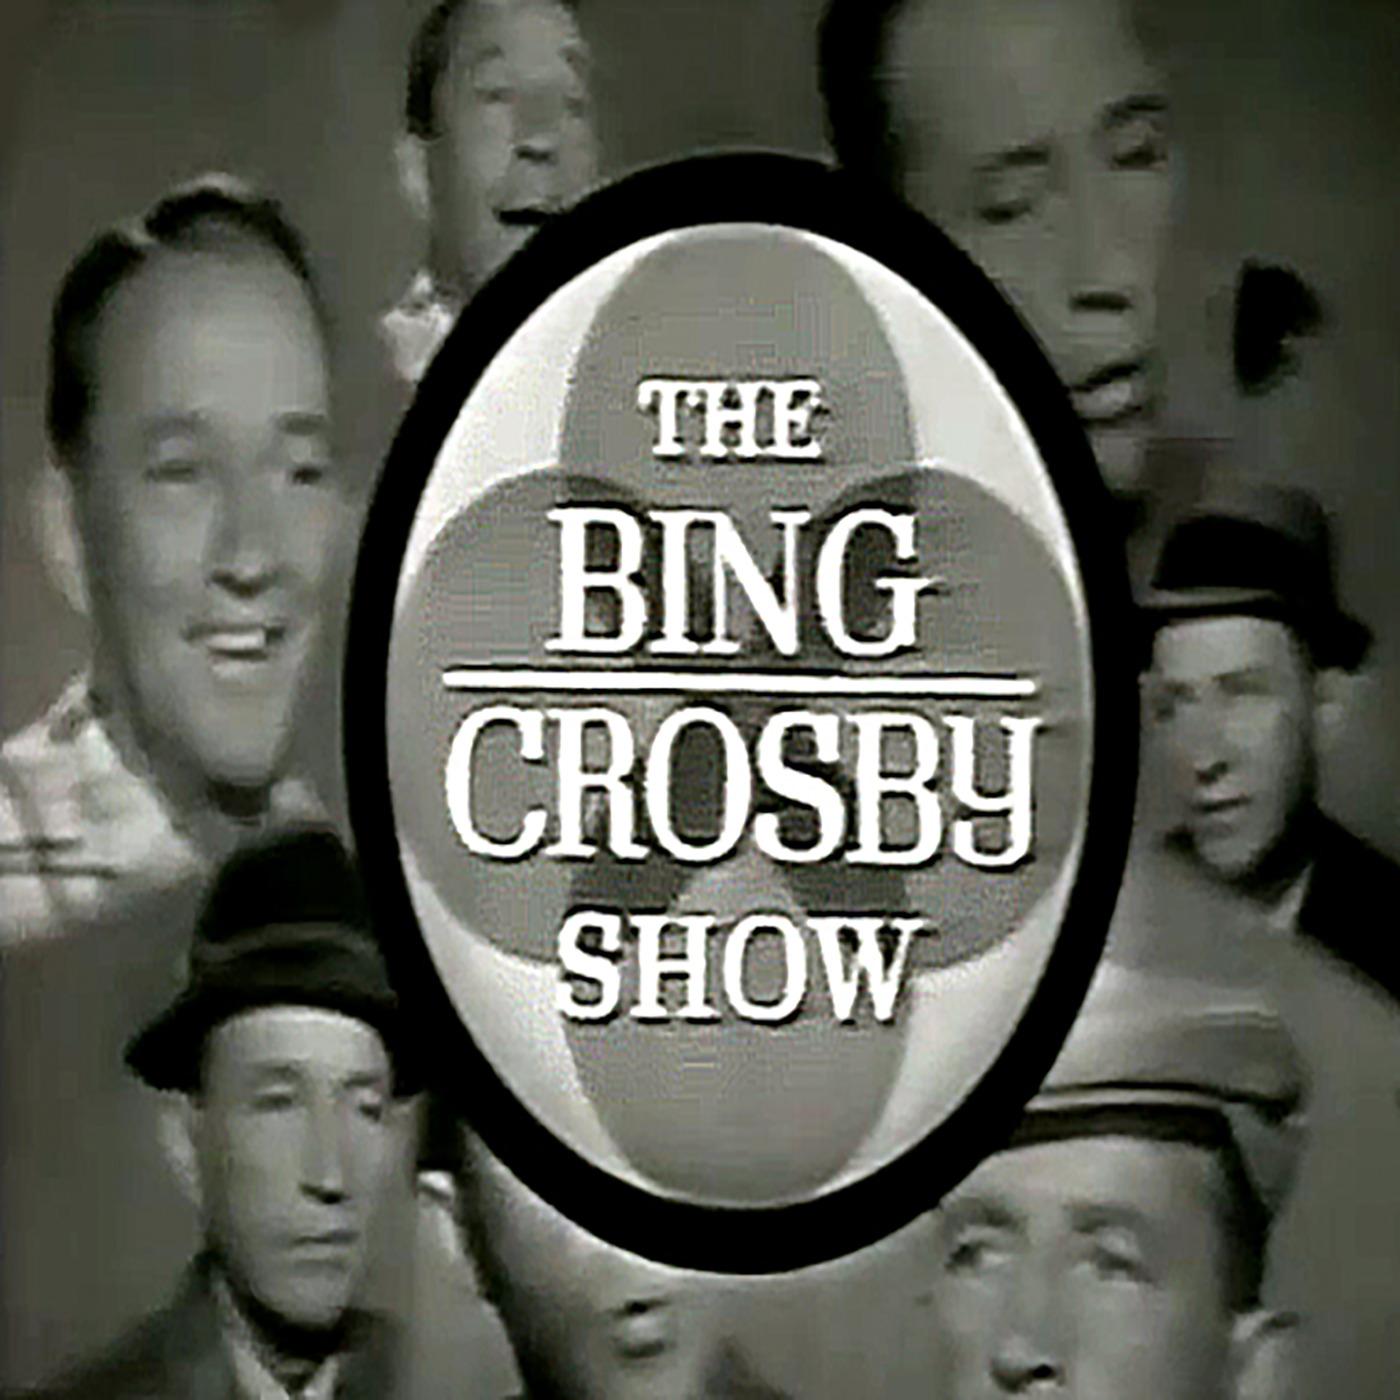 Bing Crosby Show